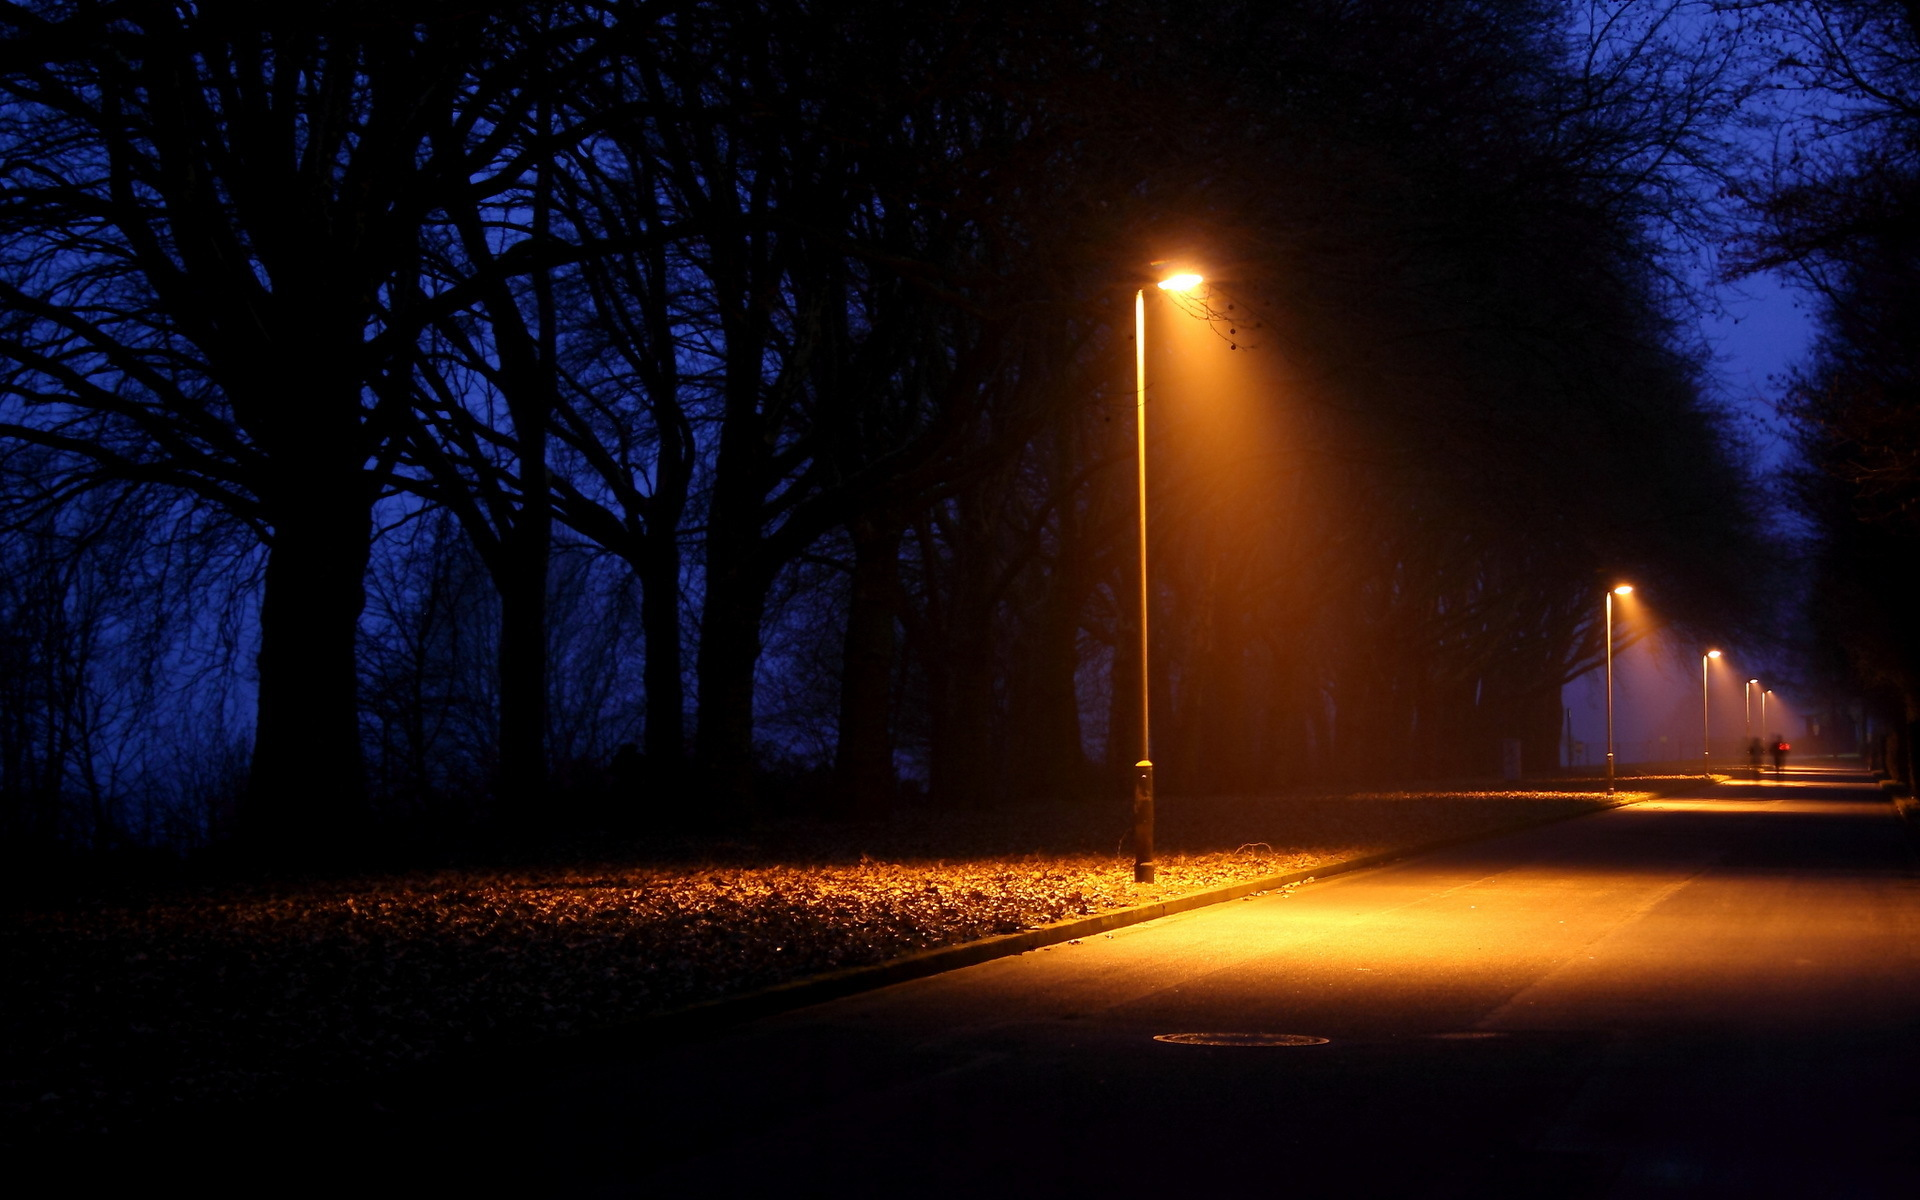 Nature Night Lights Lamps Lamp Post Trees Lightbeams Roads People Alone Wallpaper